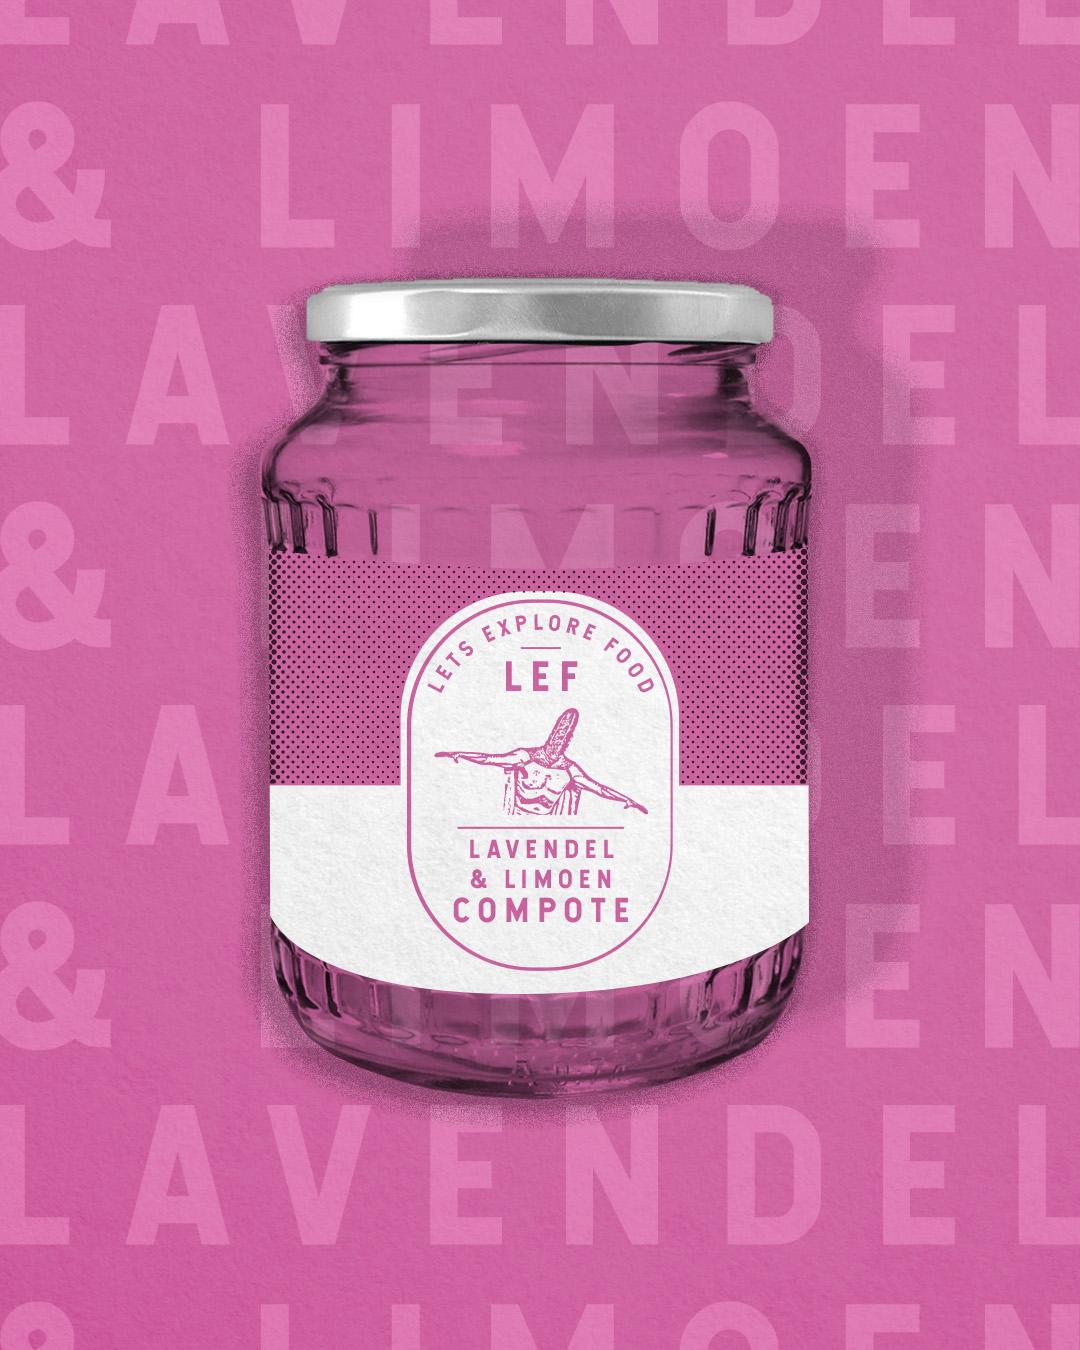 Lavendel & Limoen compote